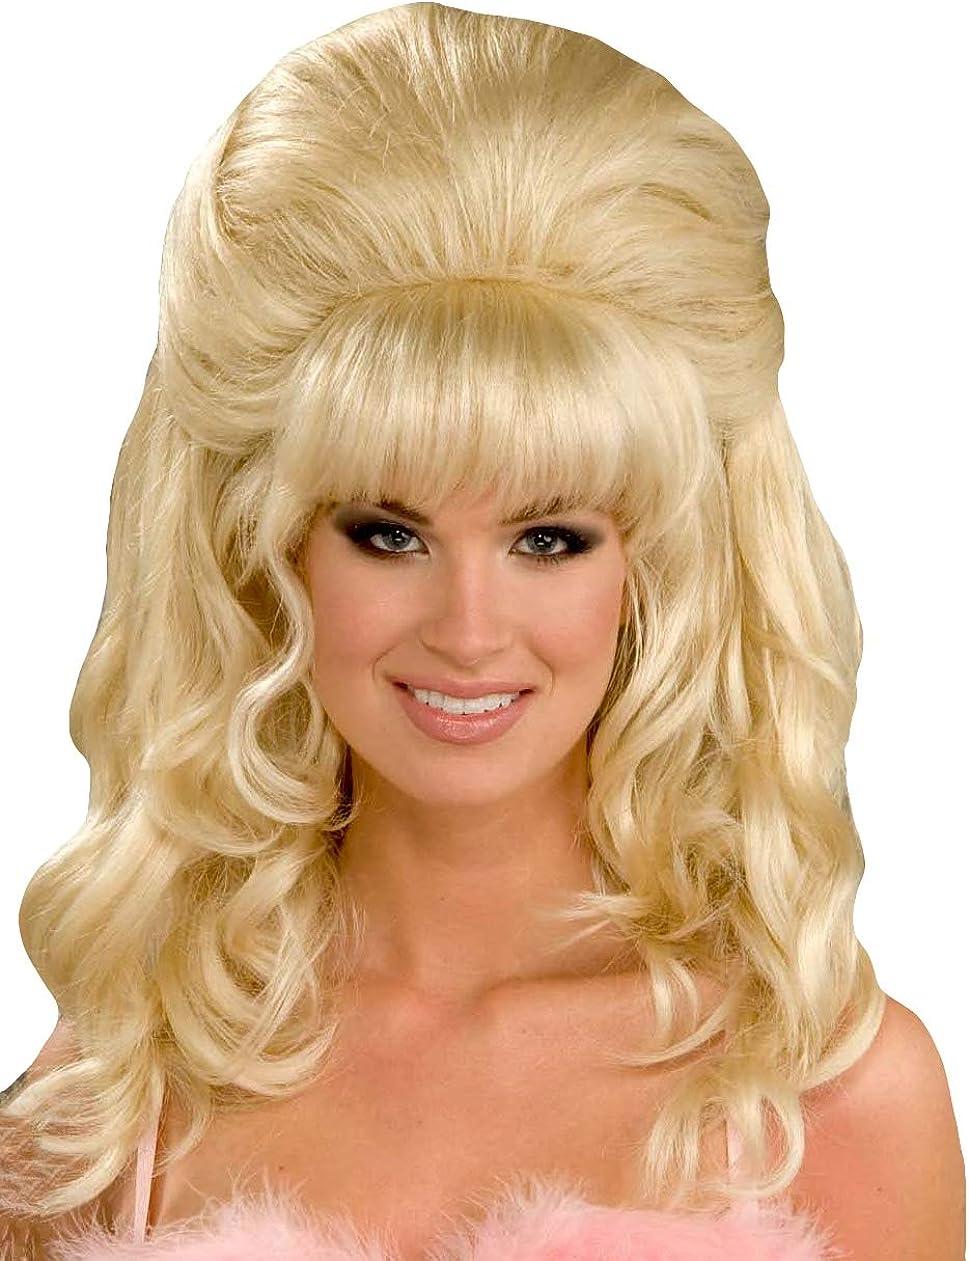 Forum Novelties Women's Flirty Fantasy Adult Wig Costume Accessory